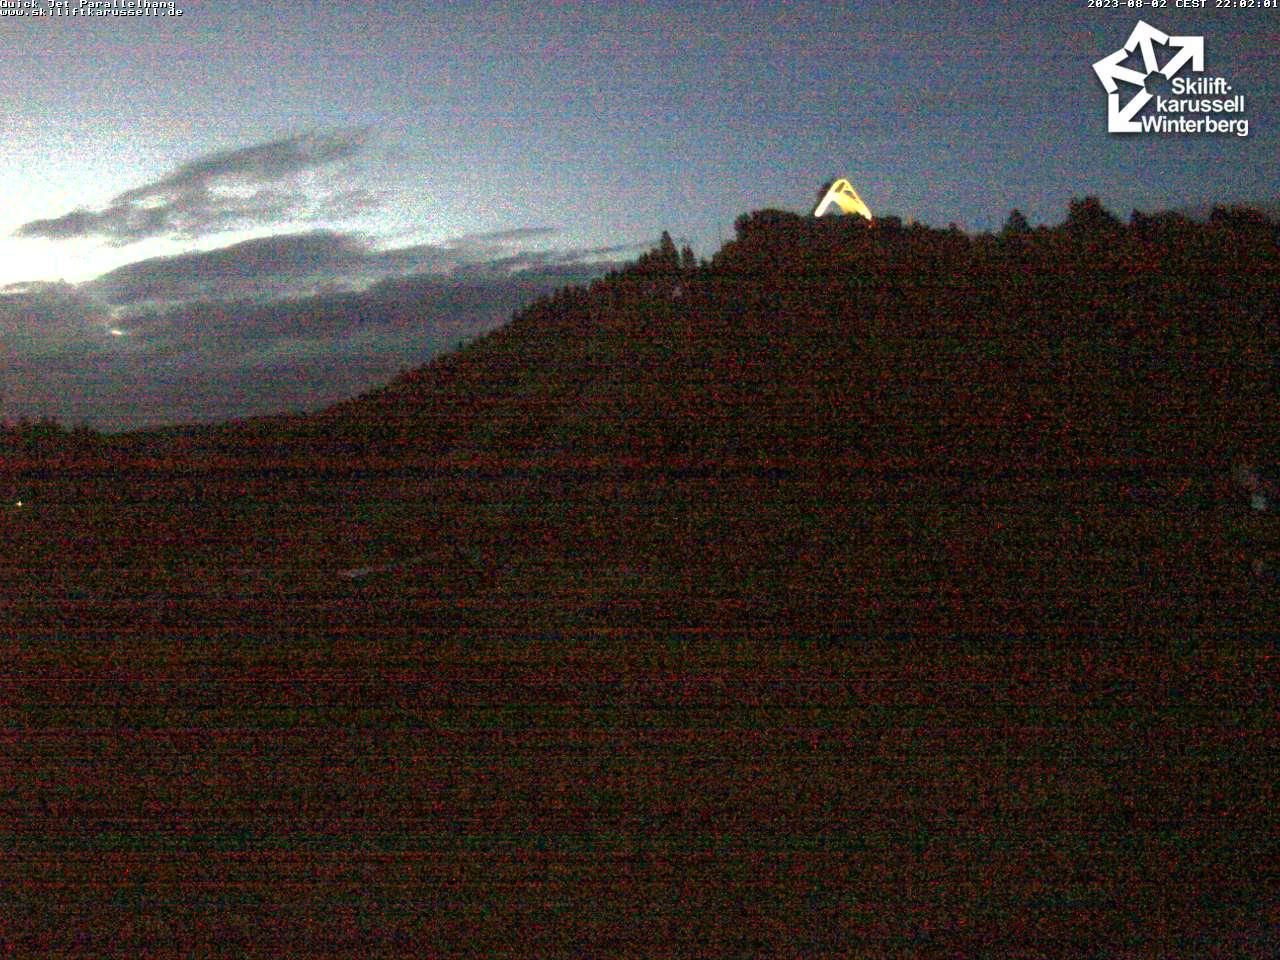 Webcam Quick Jet Parallelhang - Skiliftkarussell Winterberg